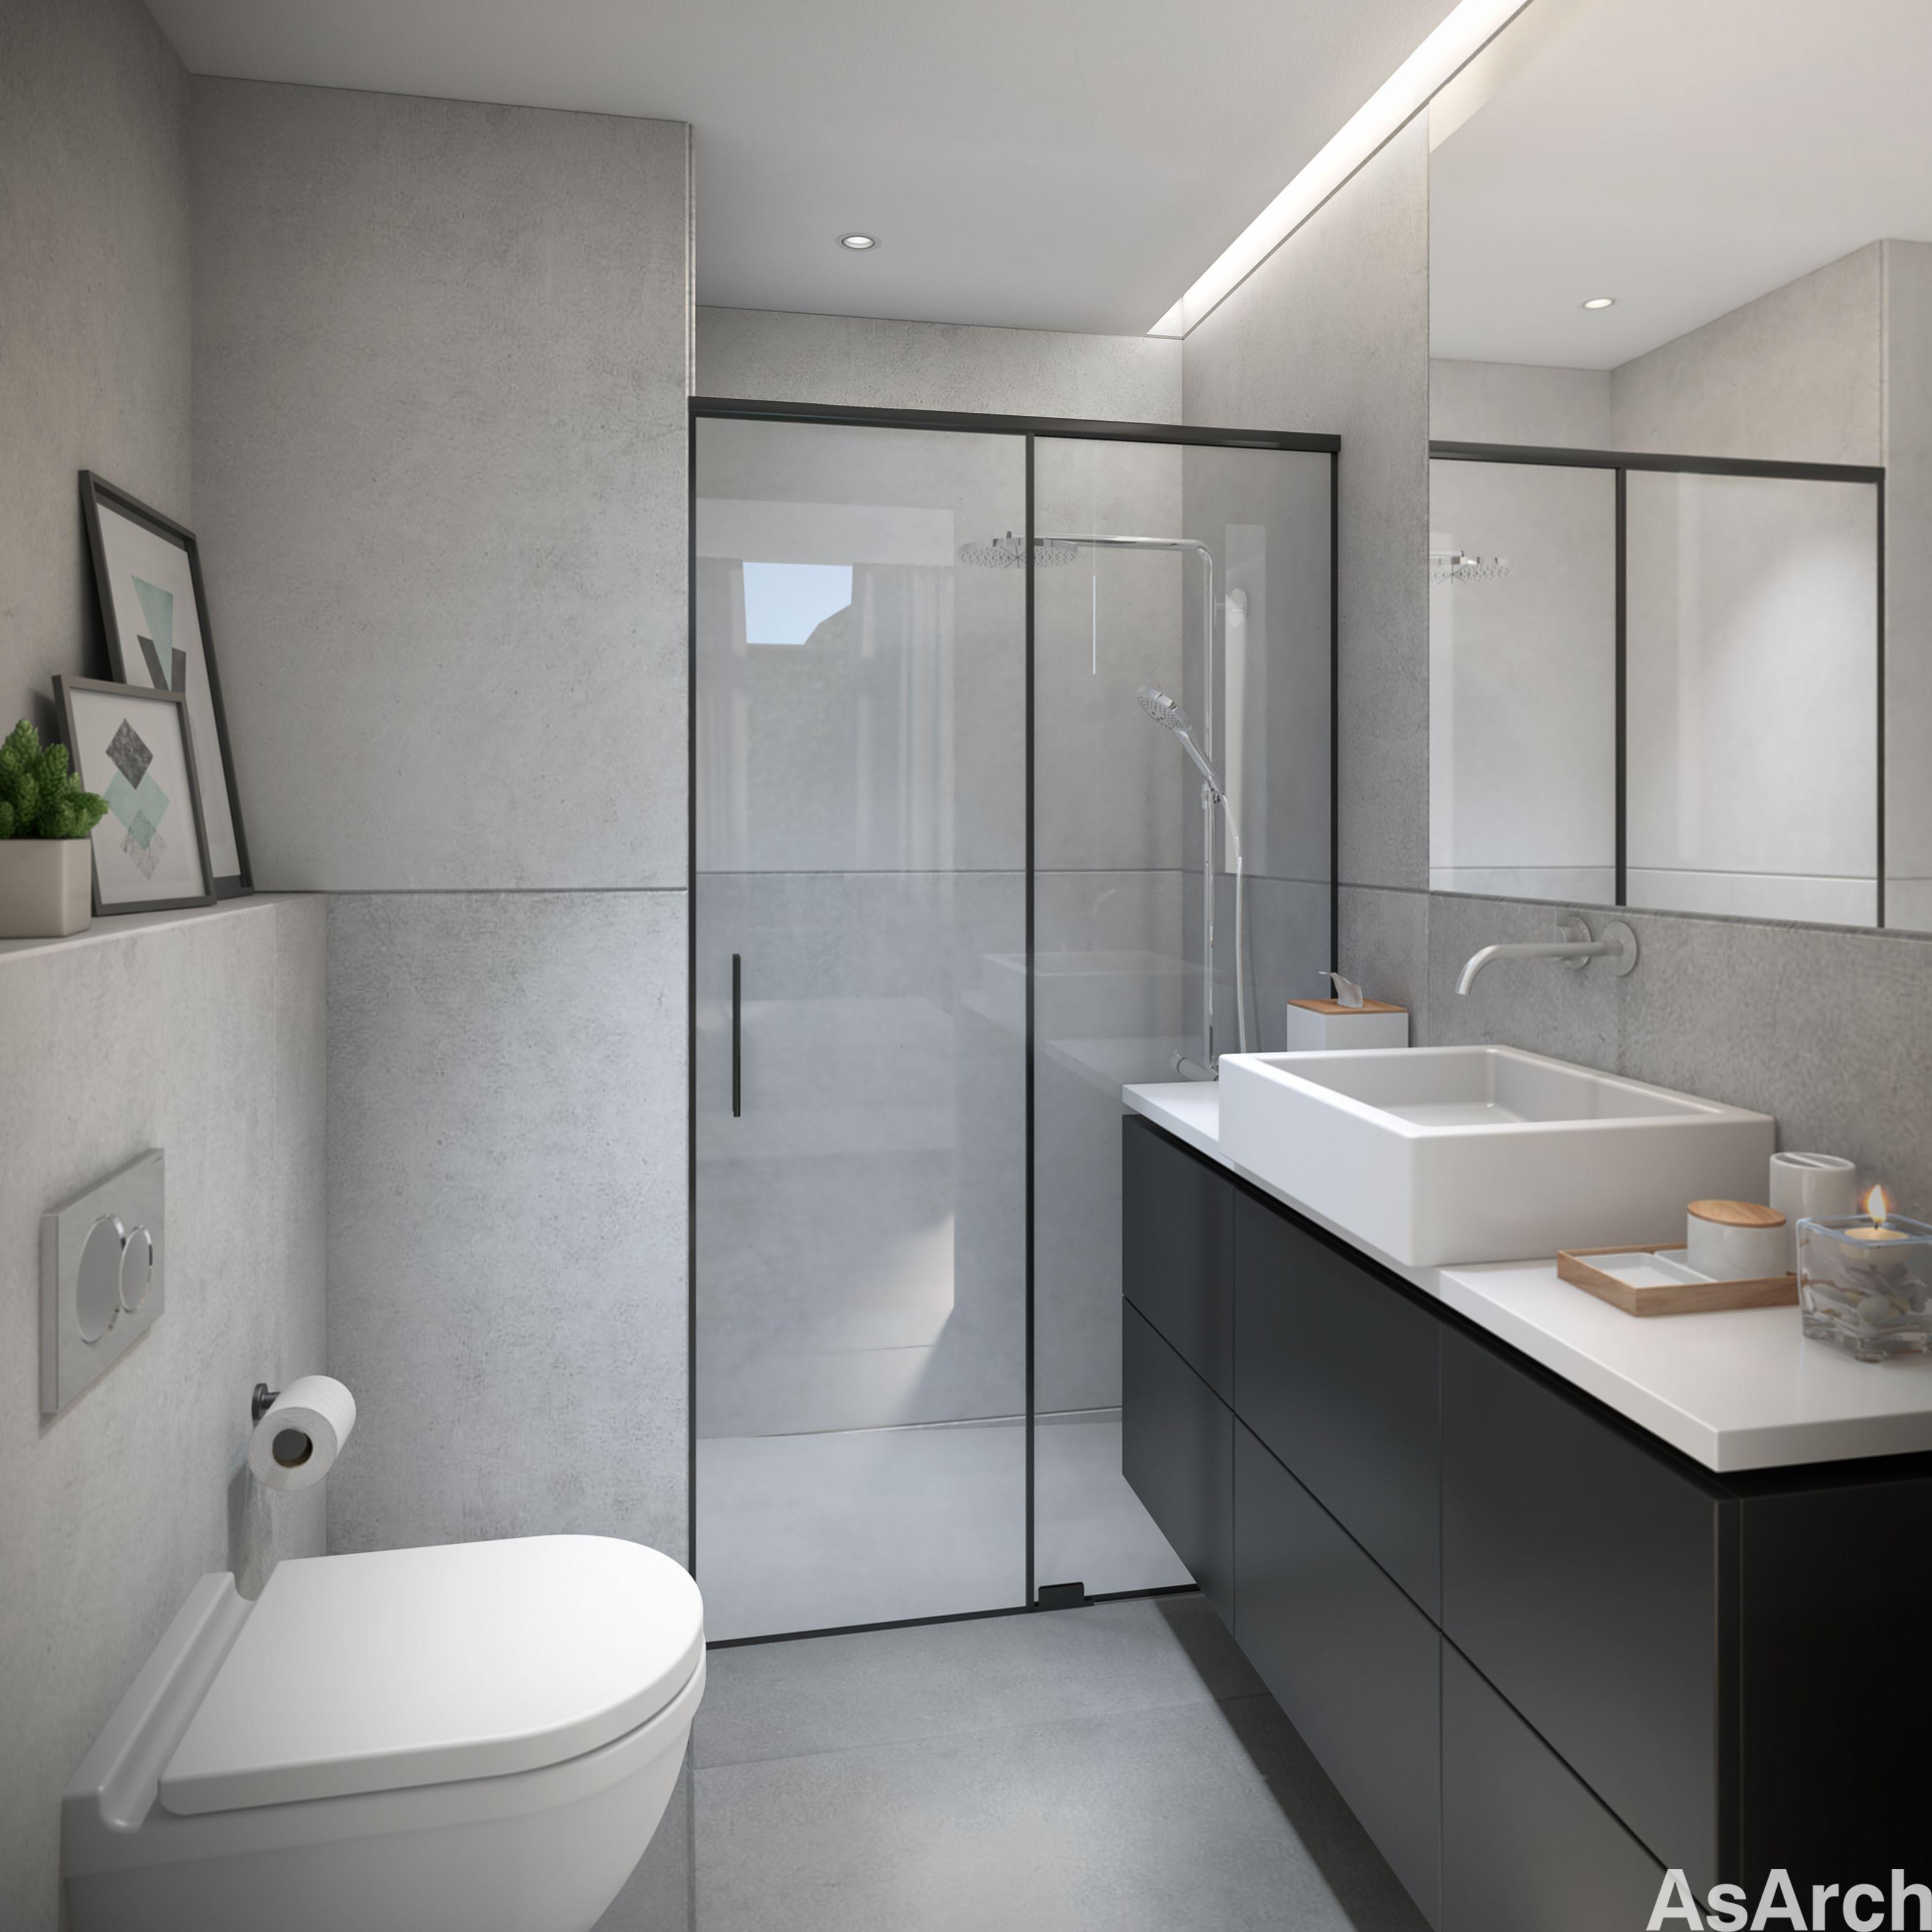 Interior Render of an Scandinavian Bathroom, designed and rendered